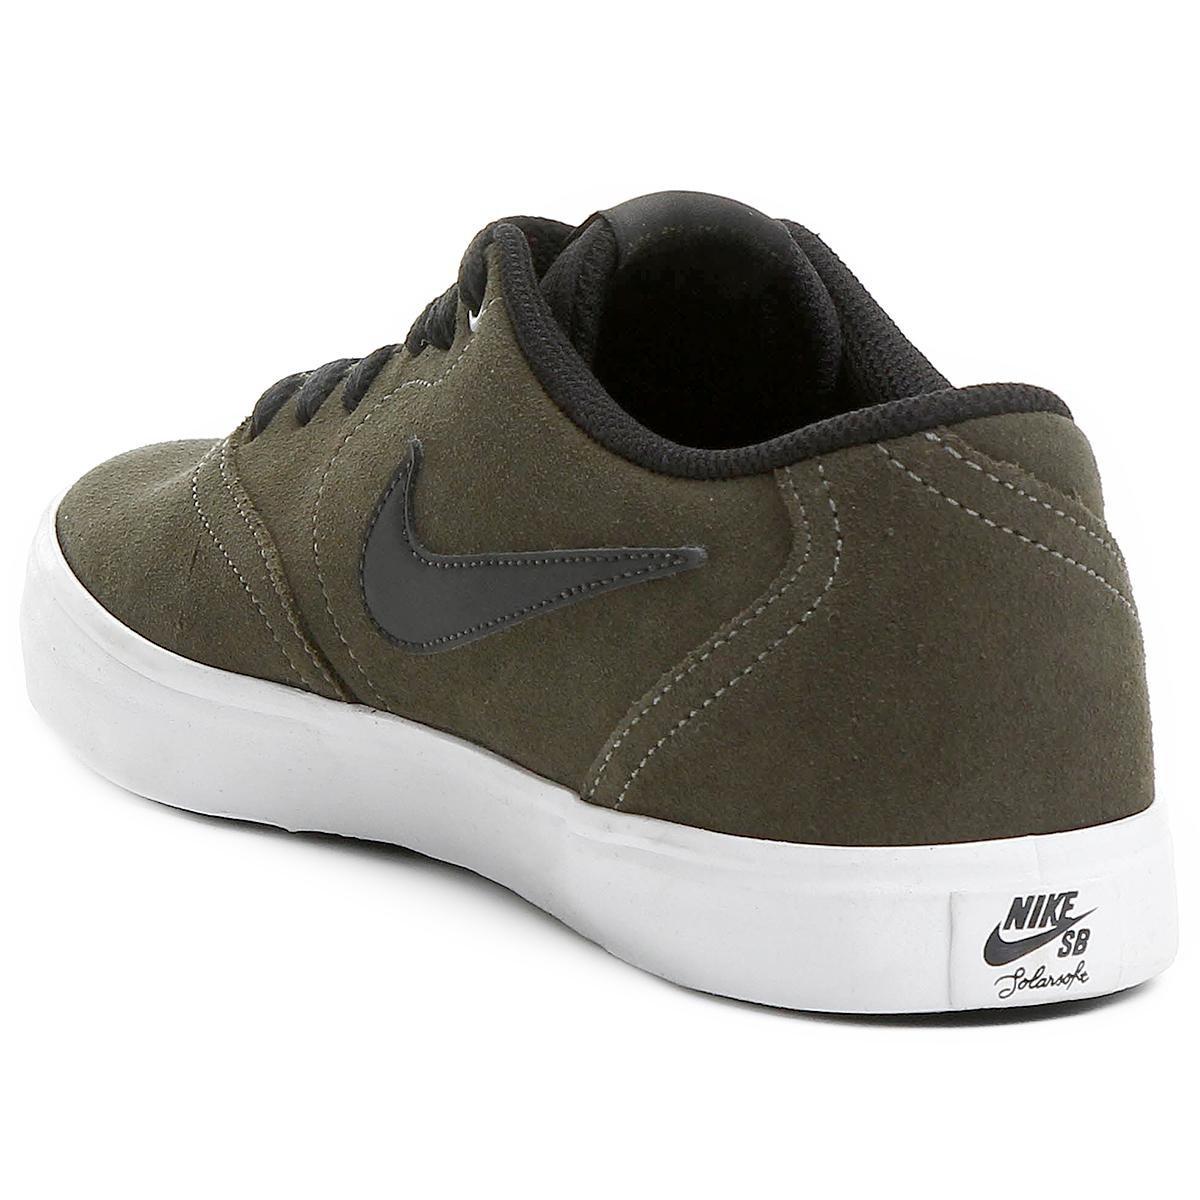 Verde Militar Check Preto Nike e Solar Masculino Sb Tênis wyqCSOHq